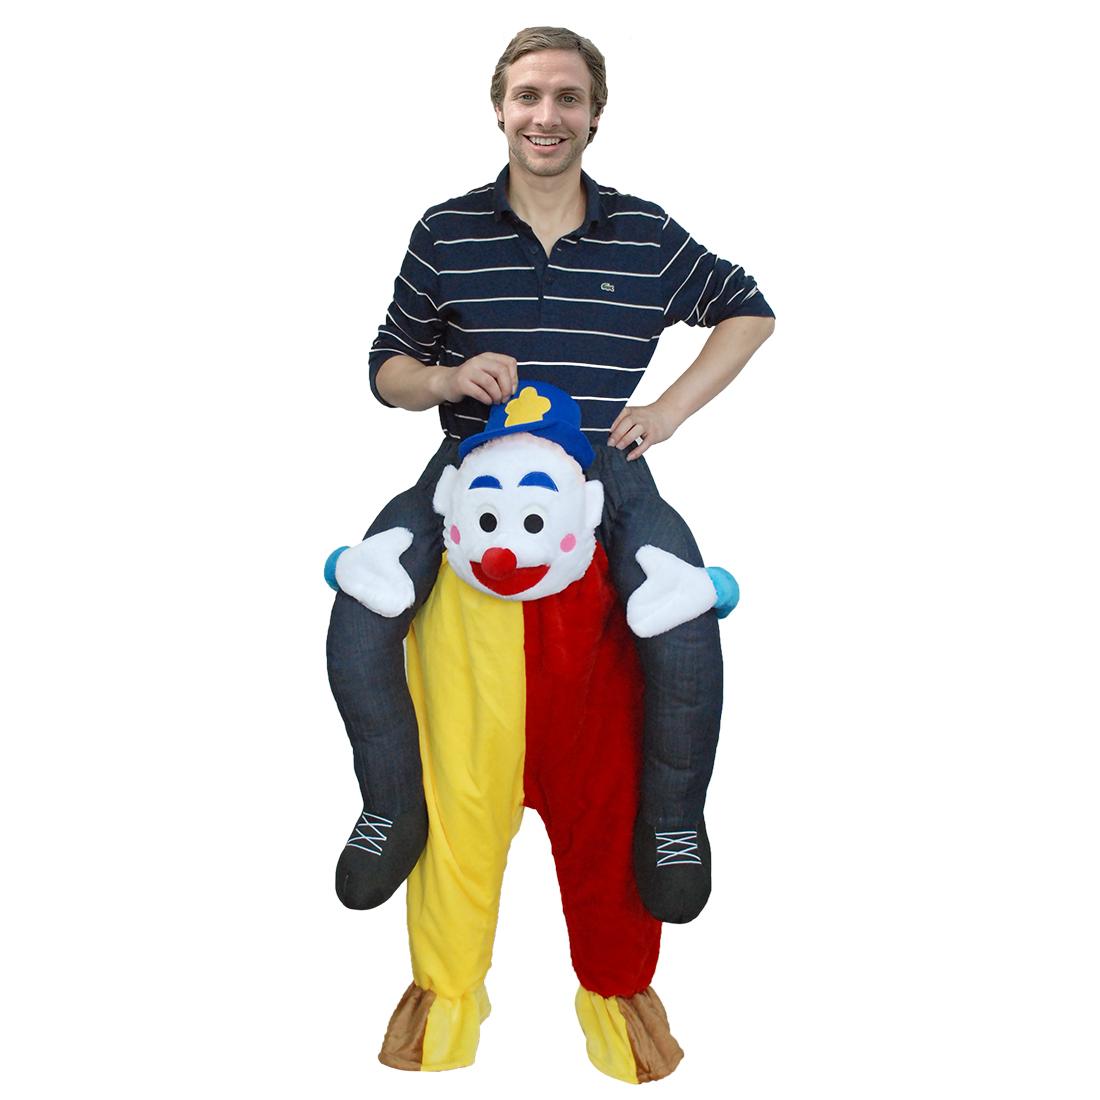 Erwachsene Carry Me (Huckepack) Kostüme Clown Maskottchen Hosen – Faschingskostüme